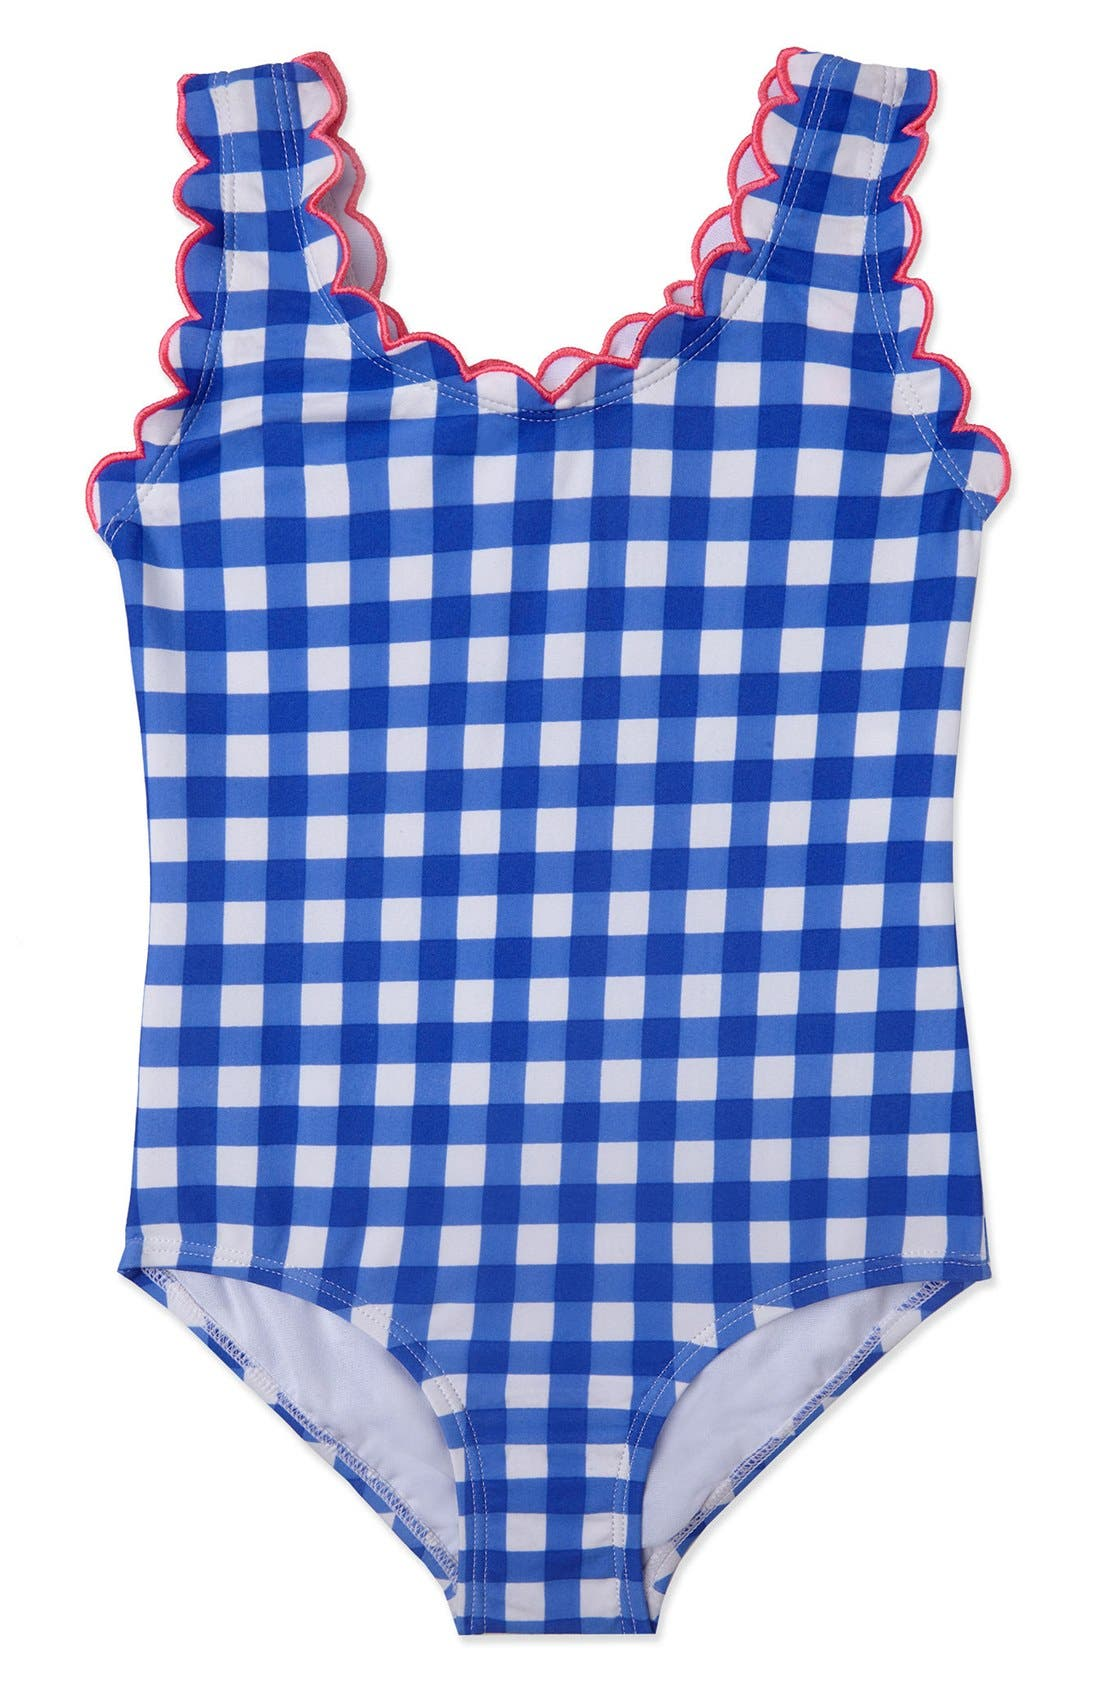 Alternate Image 1 Selected - Hula Star 'Summer Skies' One-Piece Swimsuit (Toddler Girls & Little Girls)